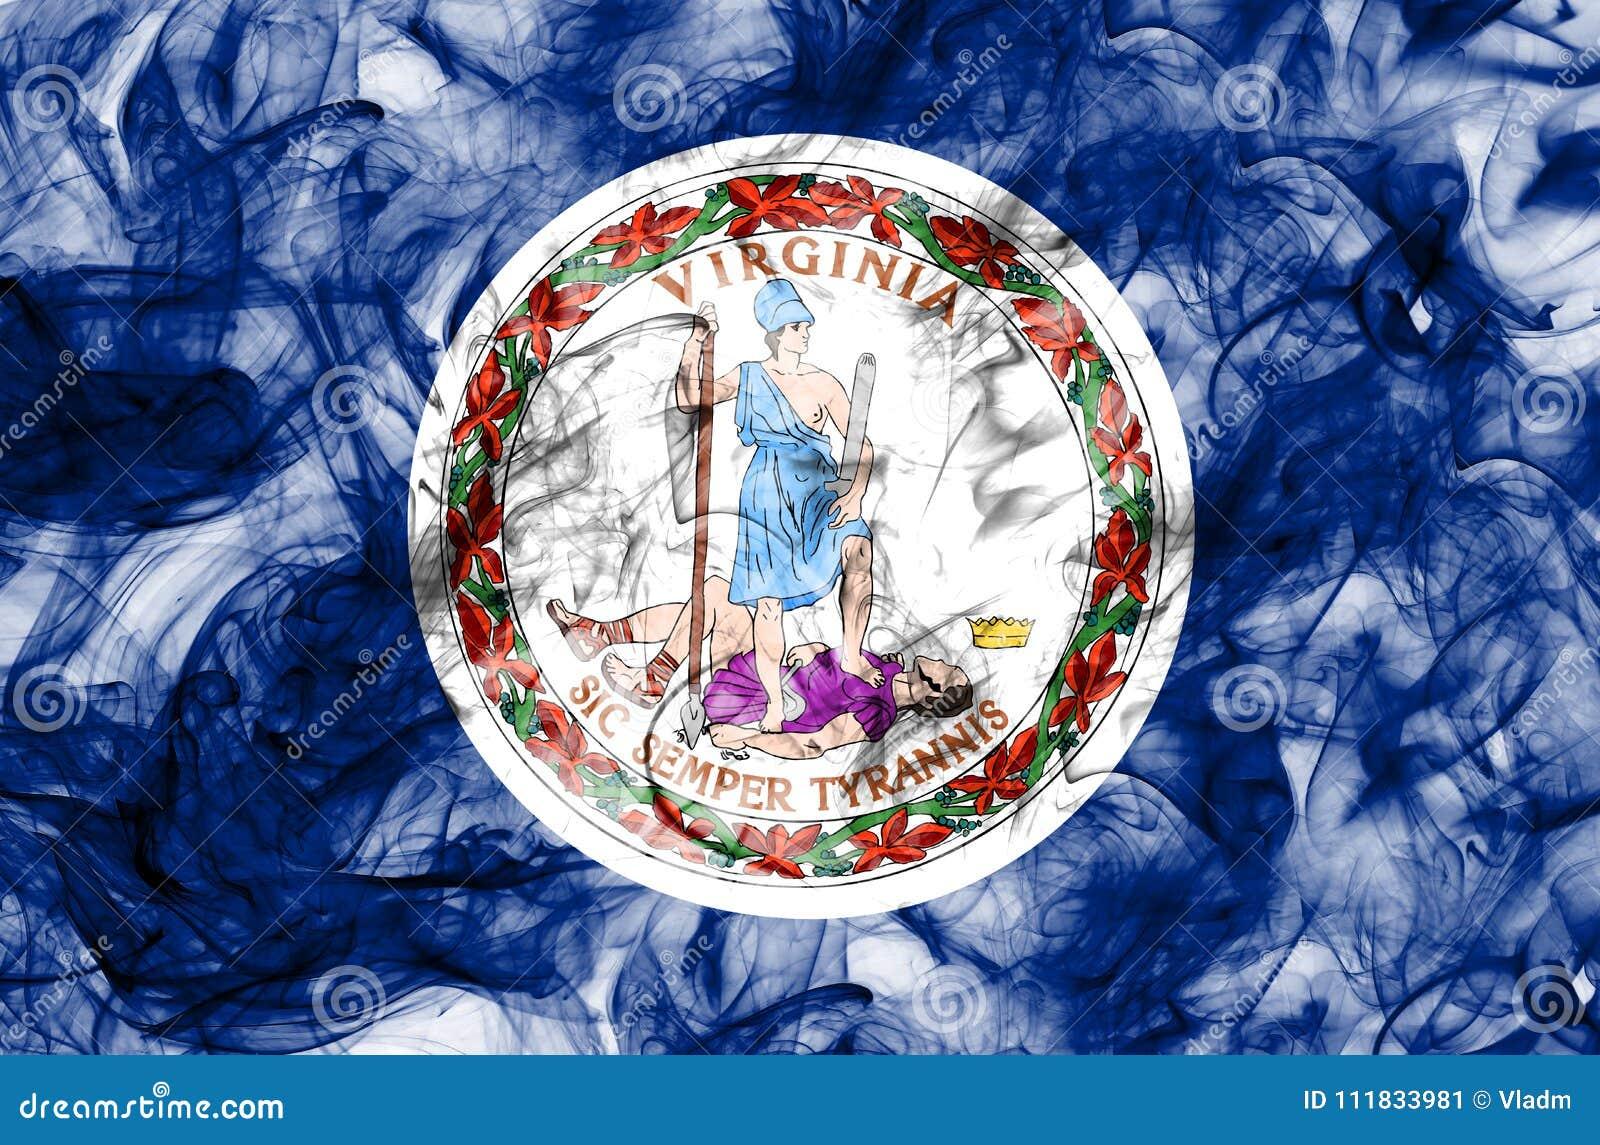 Virginia State Smoke Flag United States Of America Stock Image